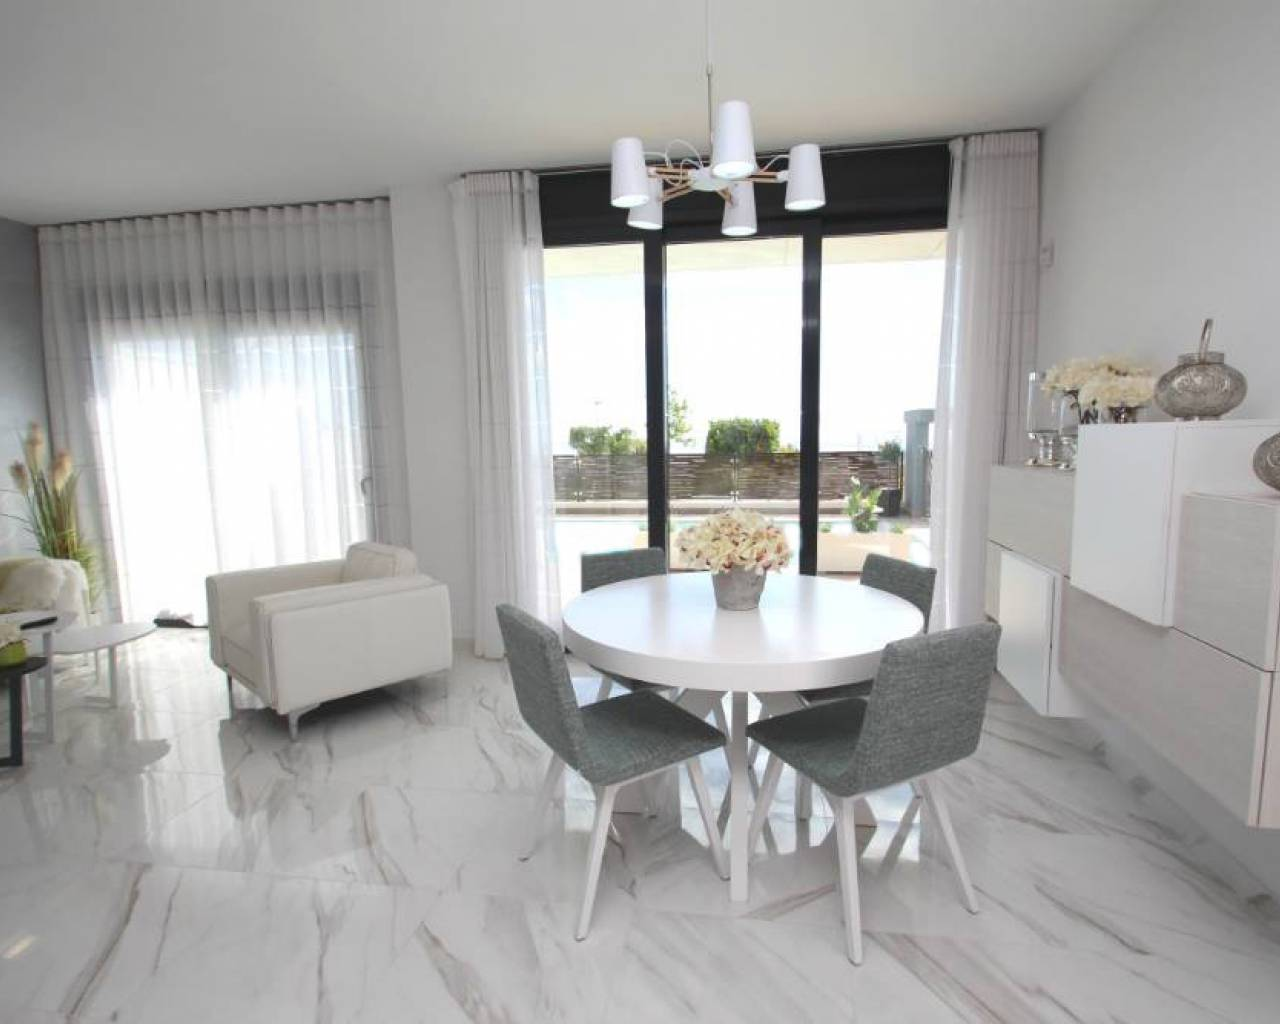 nieuwbouw-appartement-san-miguel-de-salinas_318_xl